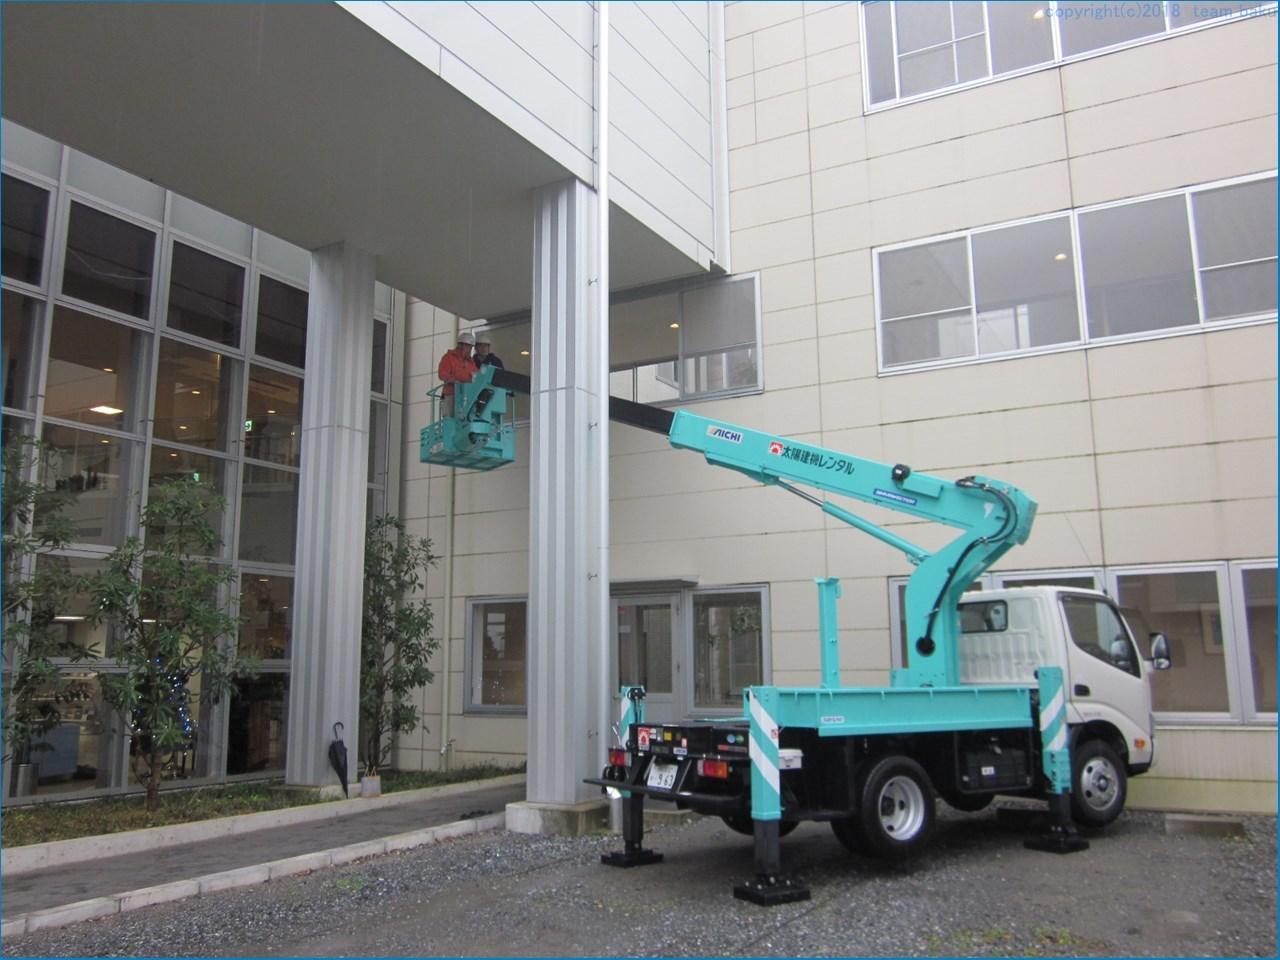 N病院グループ 特定建築物の定期報告調査4_c0376508_14134470.jpg